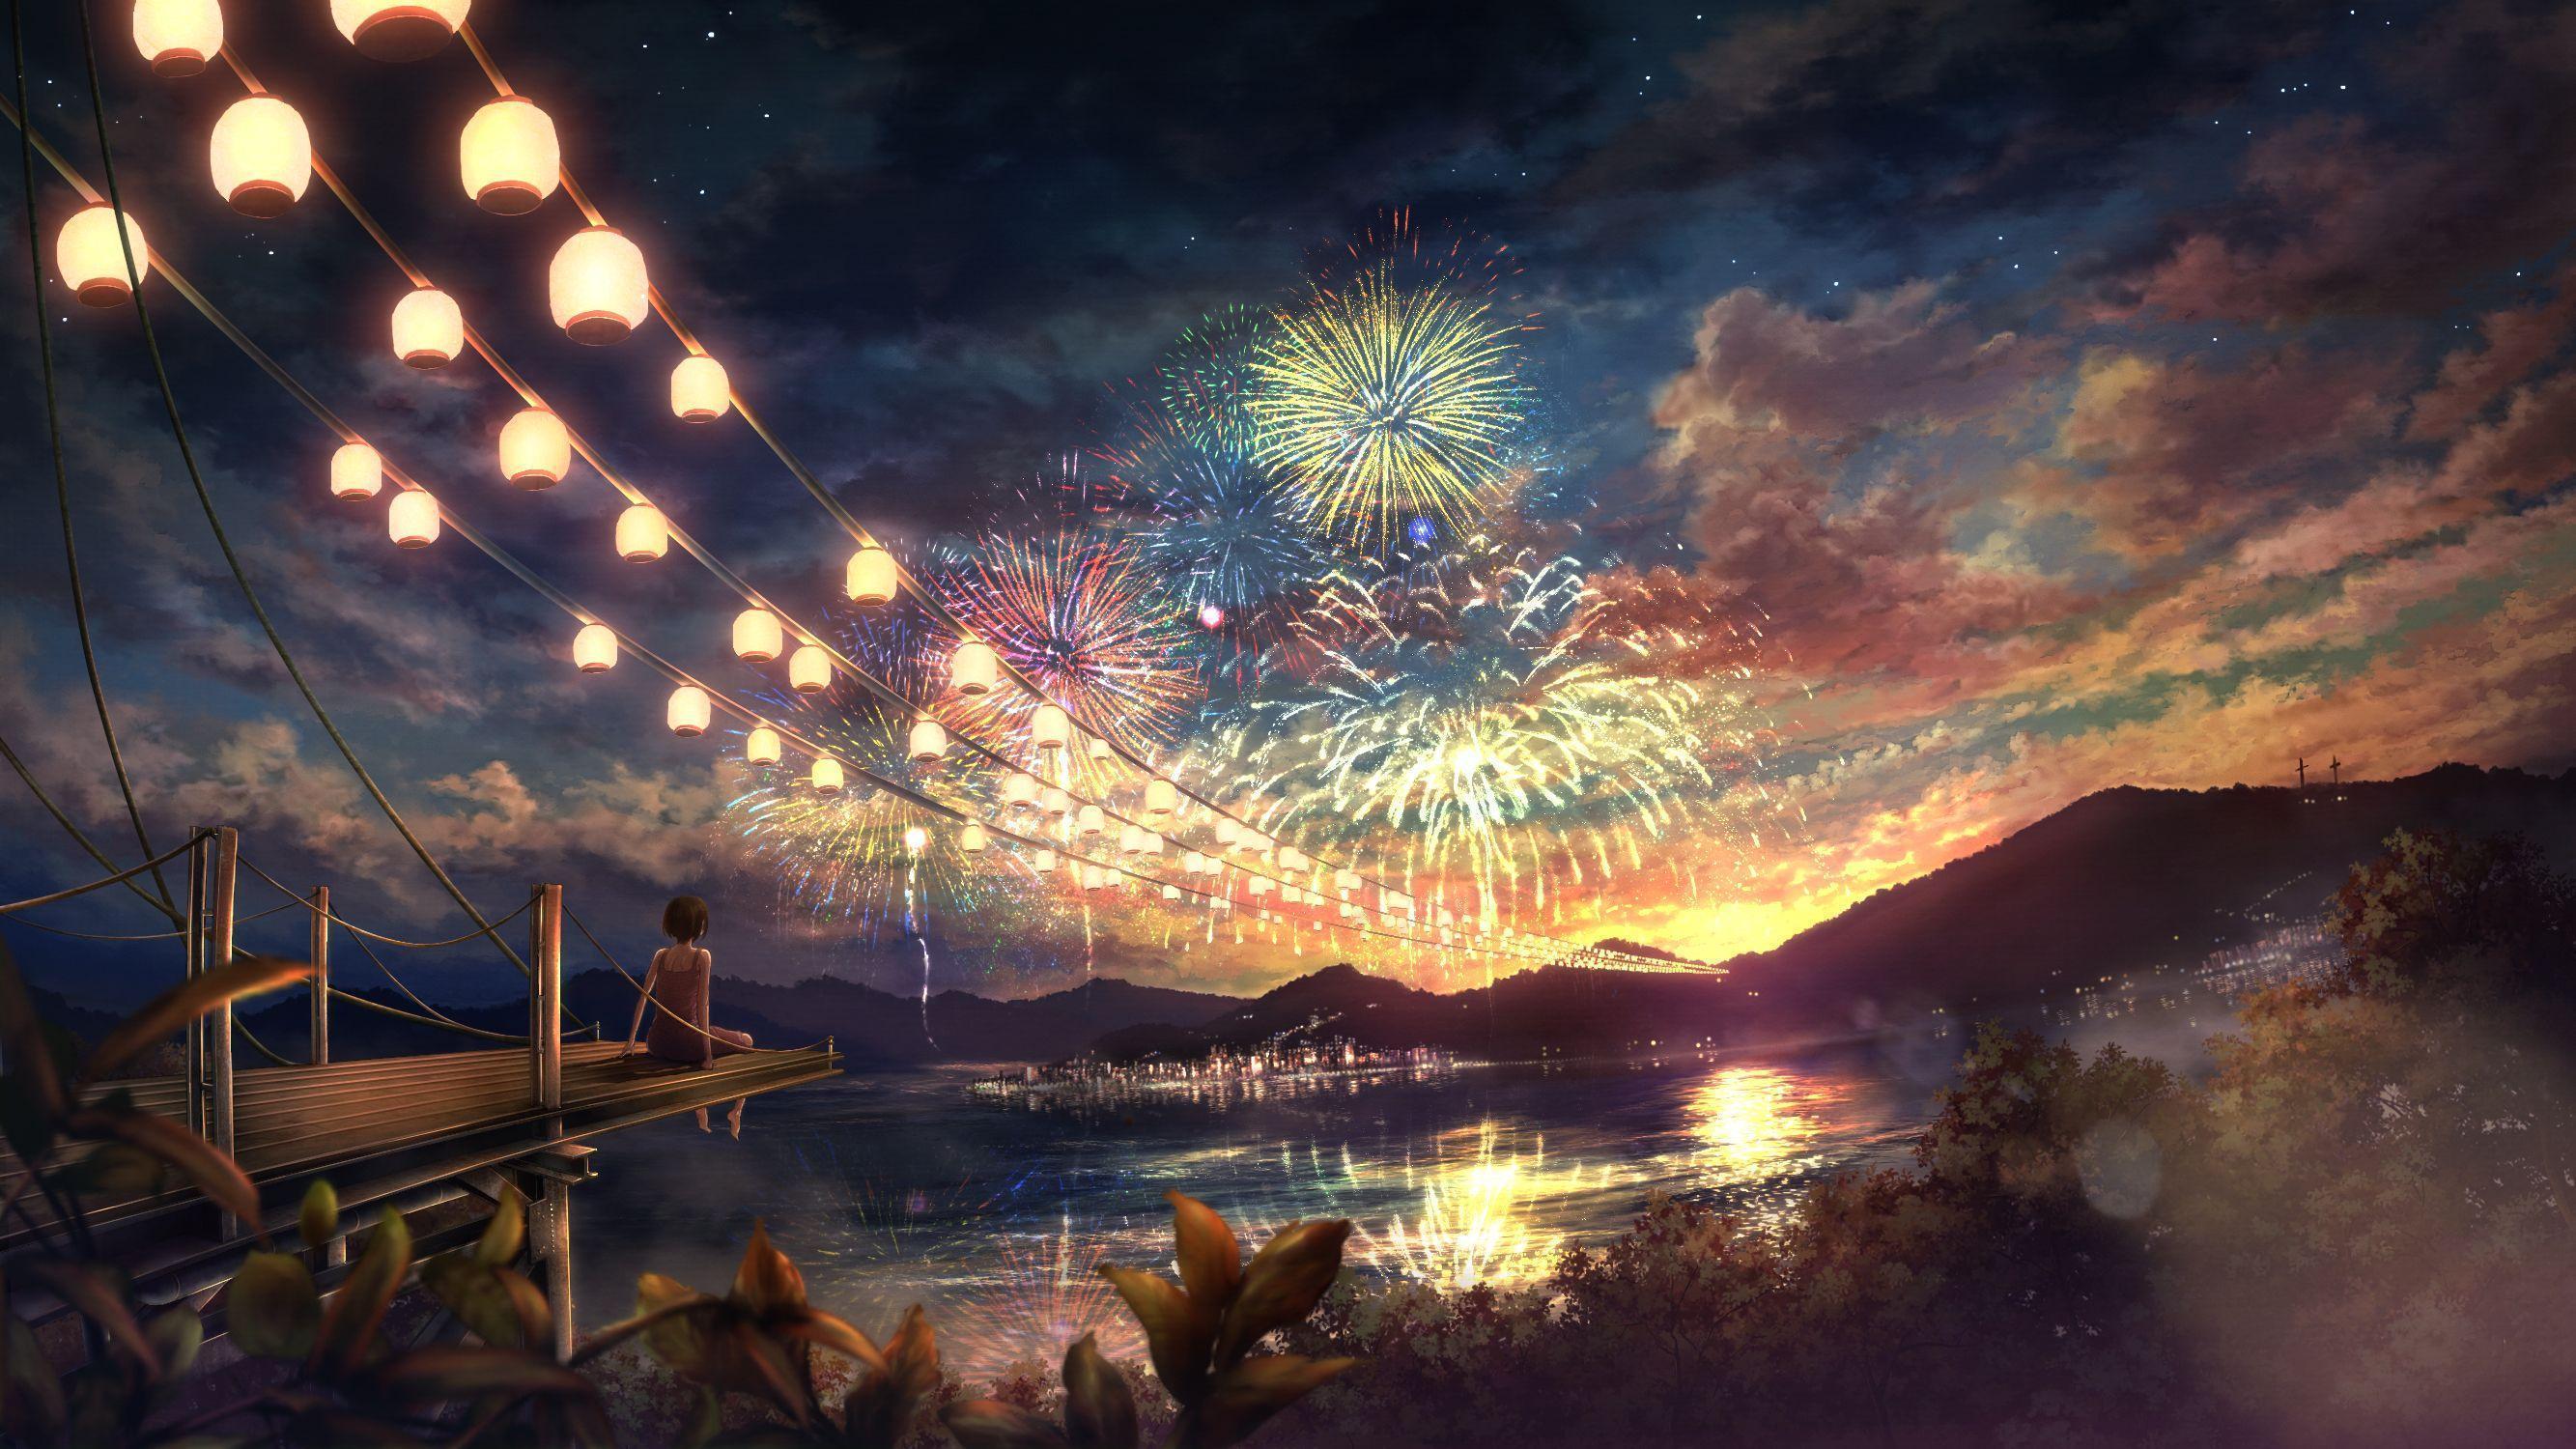 Beautiful Anime Scenery Art Wallpaper Anime Wallpapers